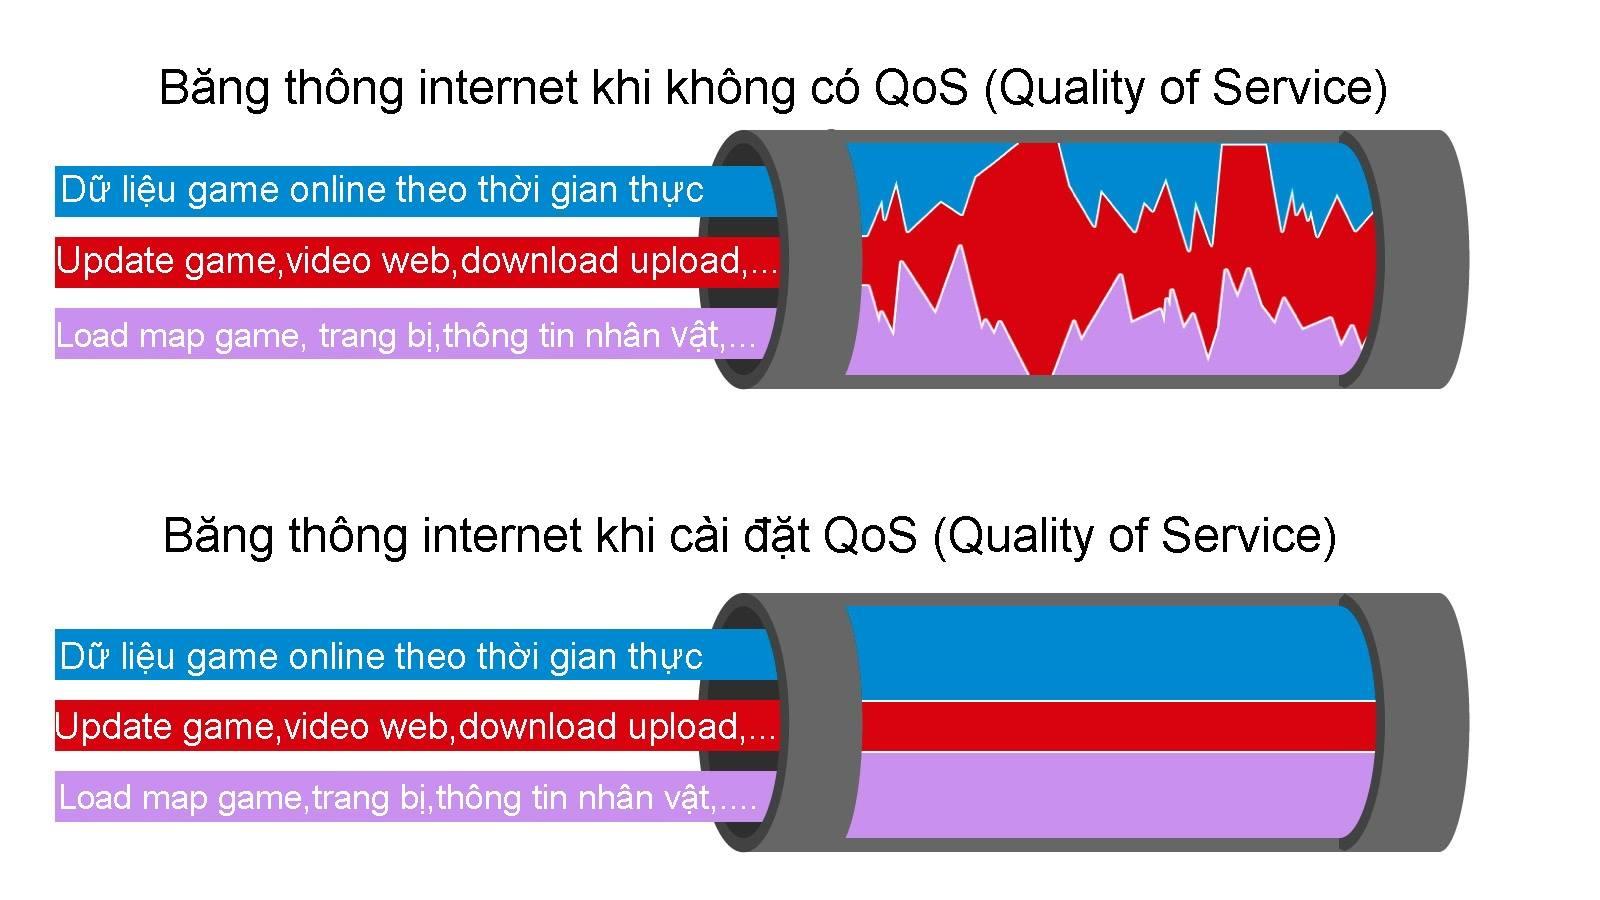 QoS game online